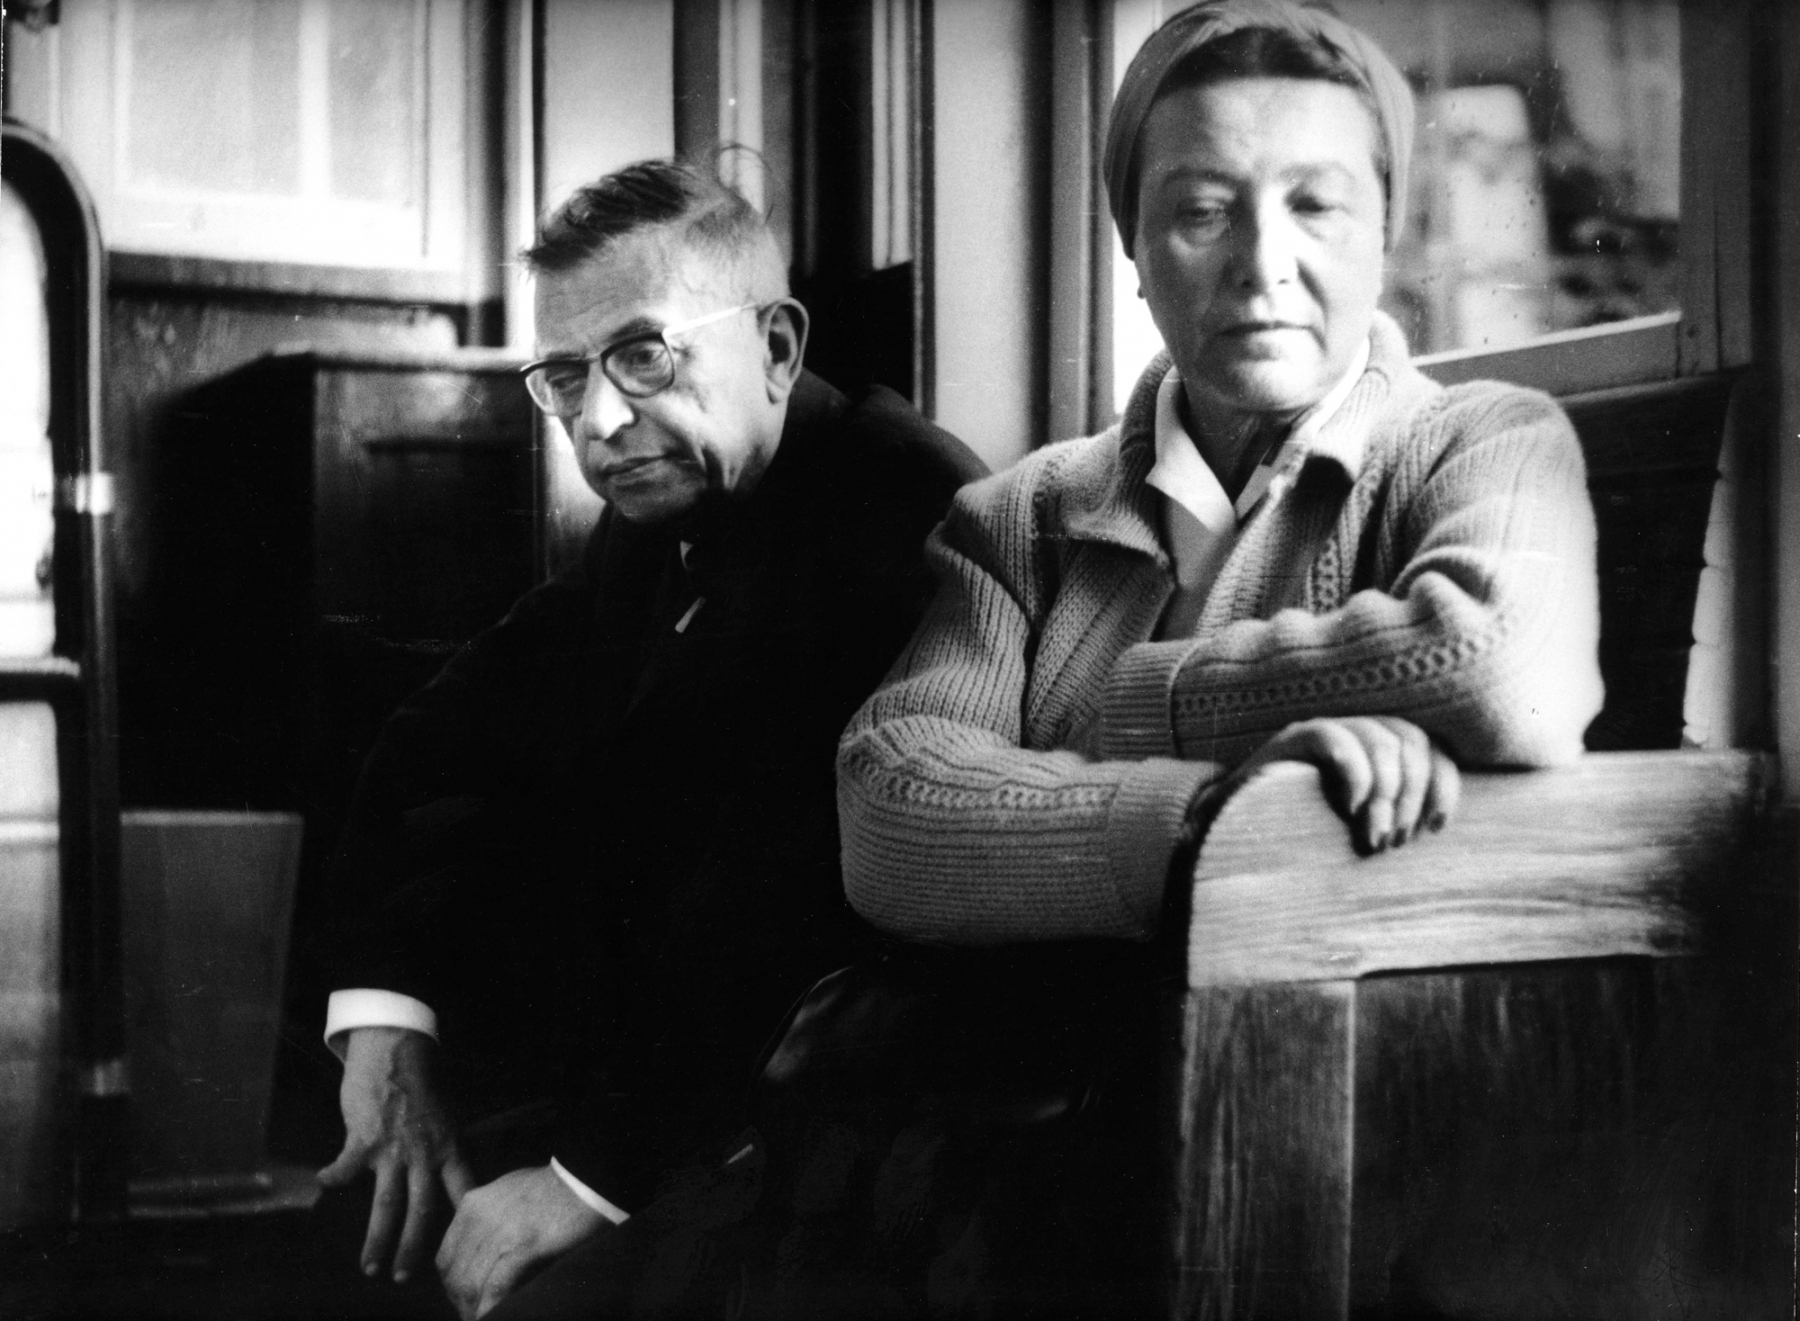 40. 1965. Ж.-П. Сартр и С. де Бовуар в Литве. Каунас